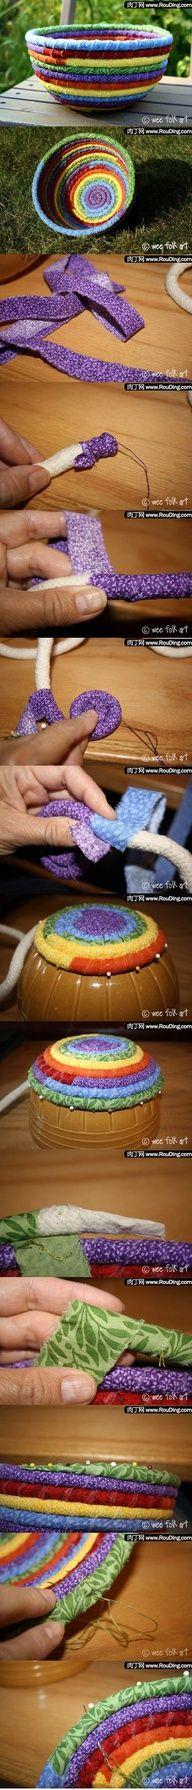 How to make a decorative fabric bowl.